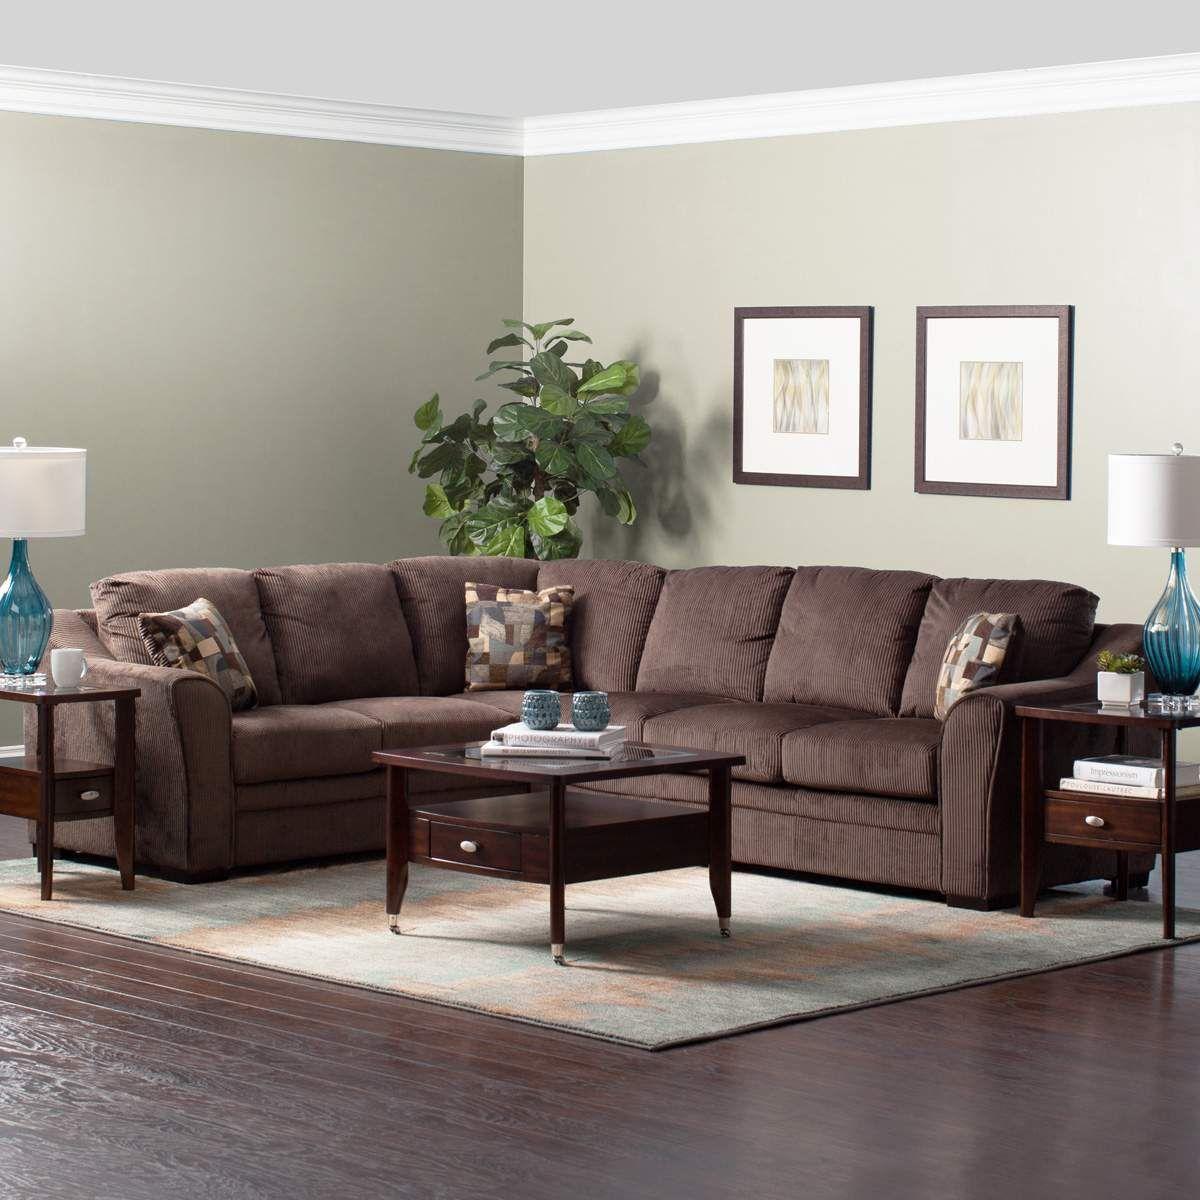 Miraculous Sits Like A Soft Sofa But Sleeps Like A Bed The Jennifer Frankydiablos Diy Chair Ideas Frankydiabloscom